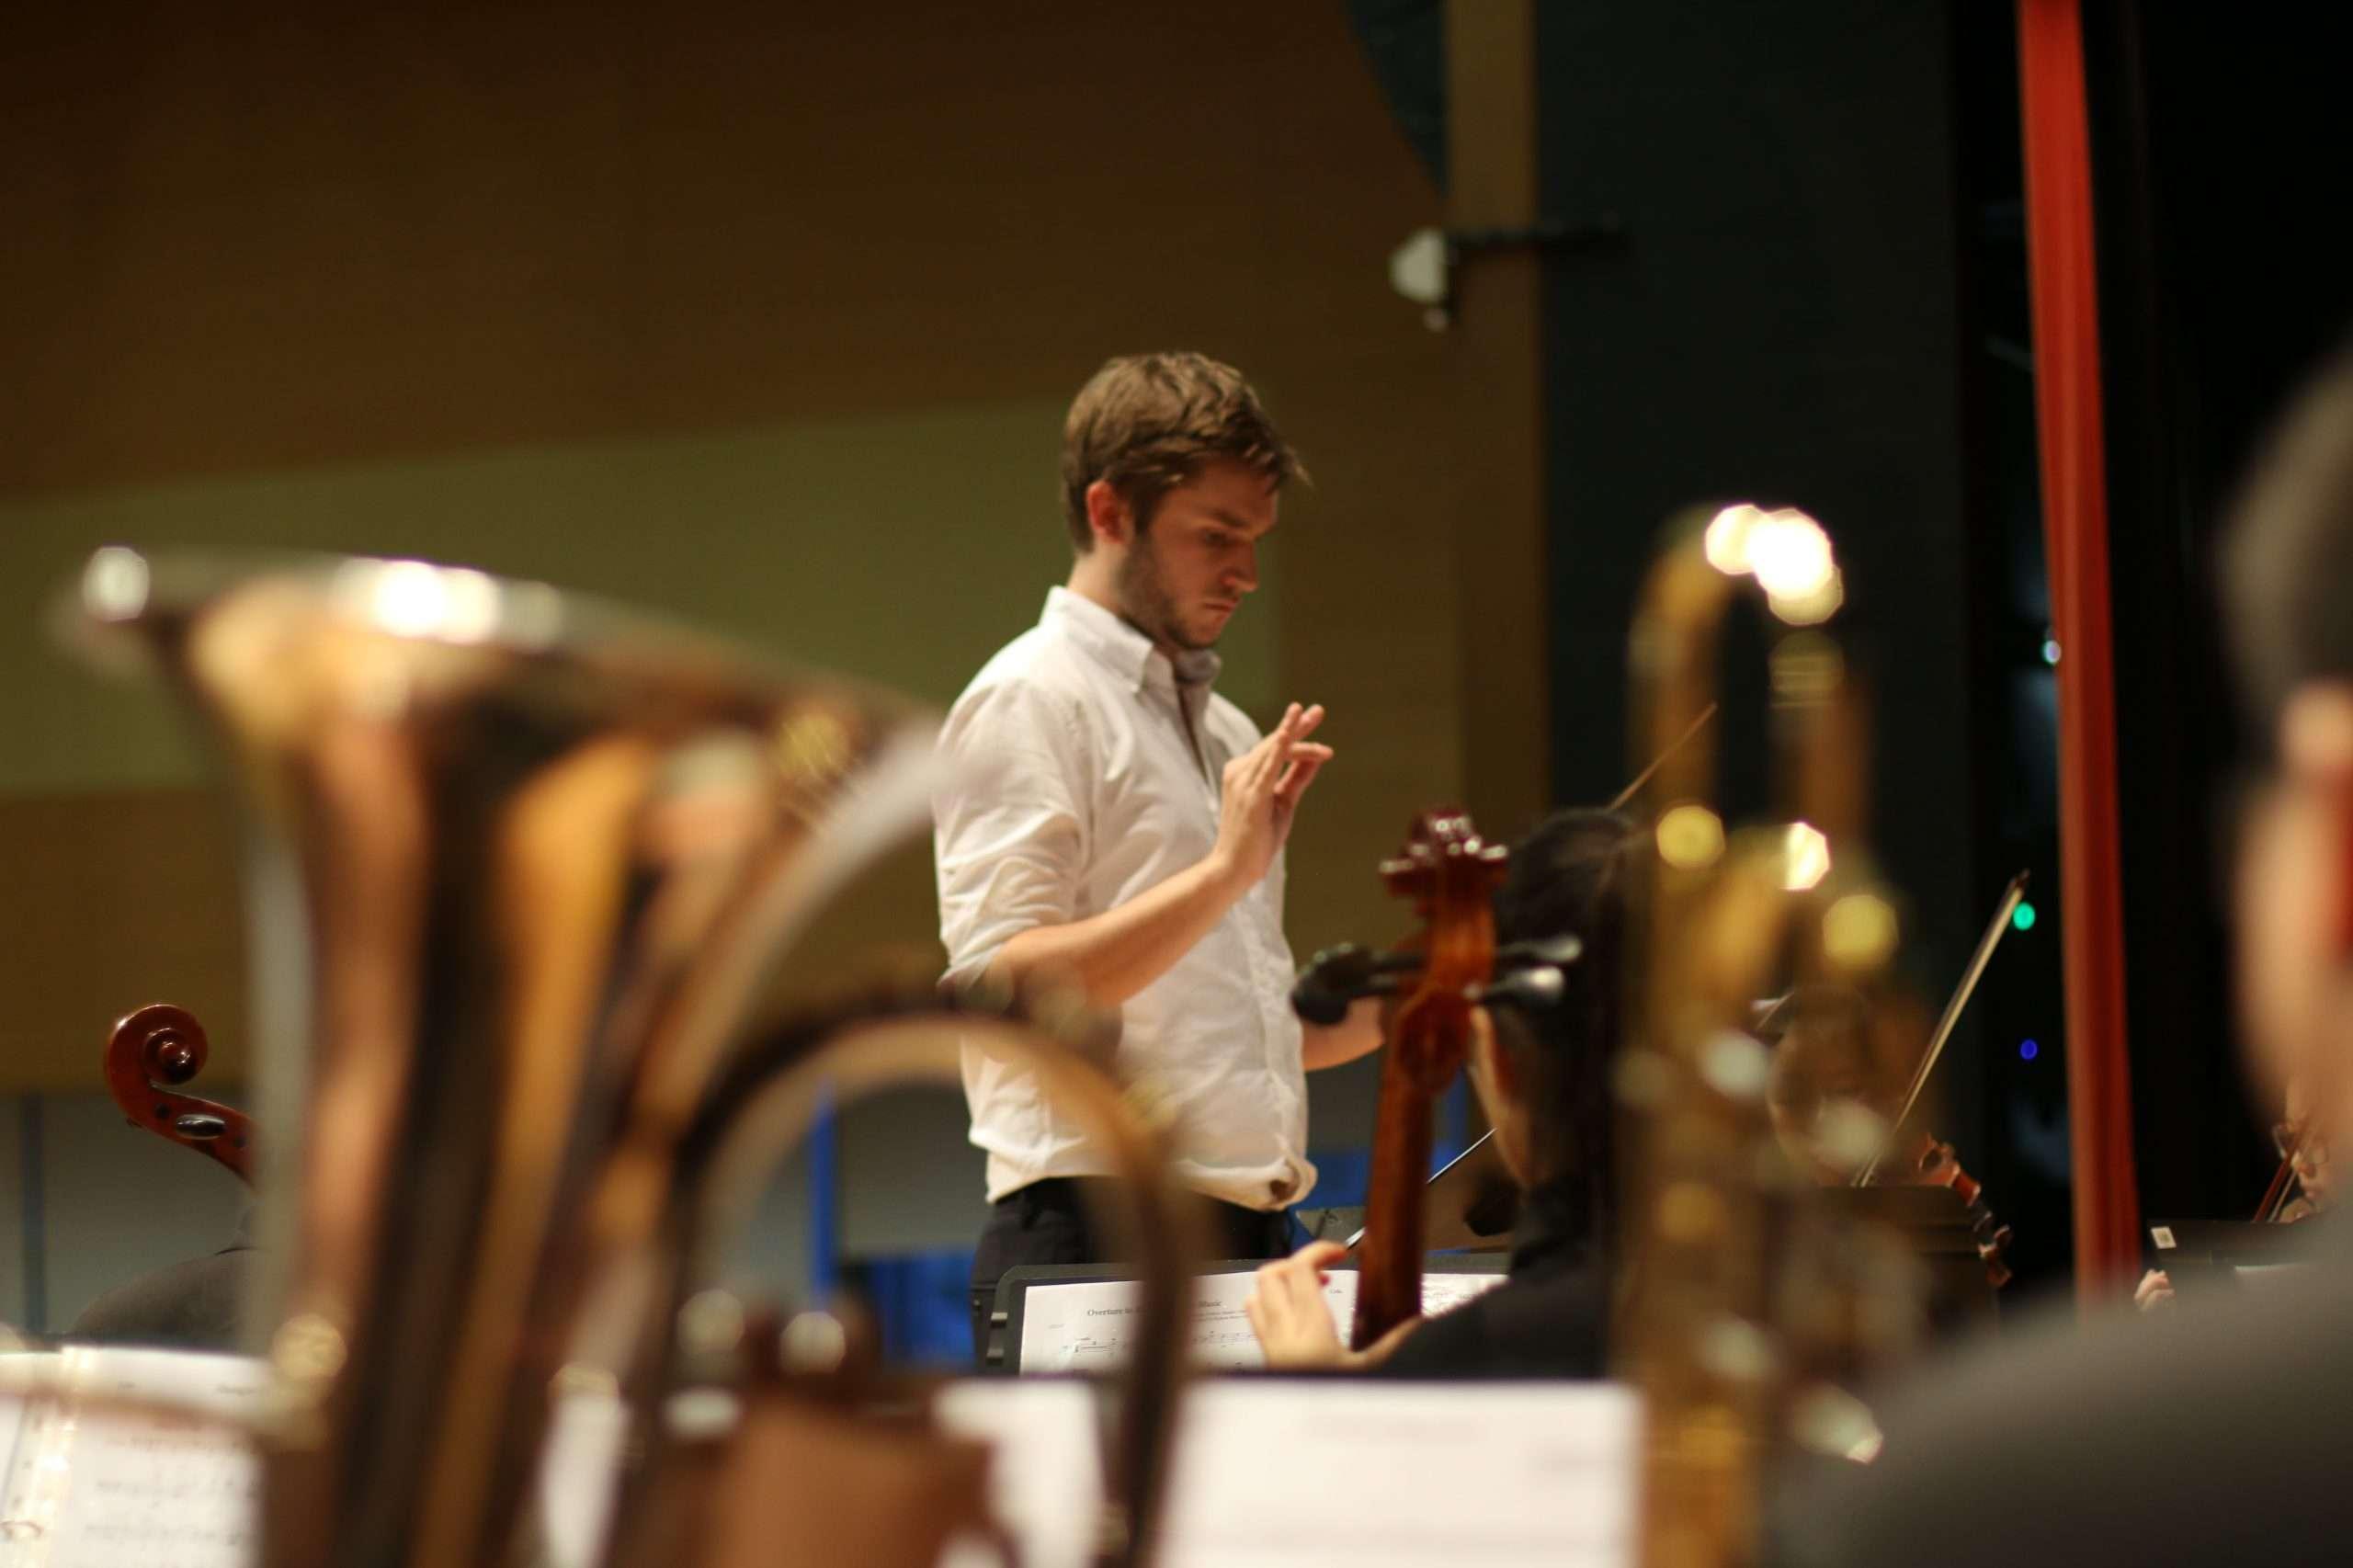 #Dronestagram: A Glimpse into AISB Music Teacher Thomas O'Grady's Passion for Photography